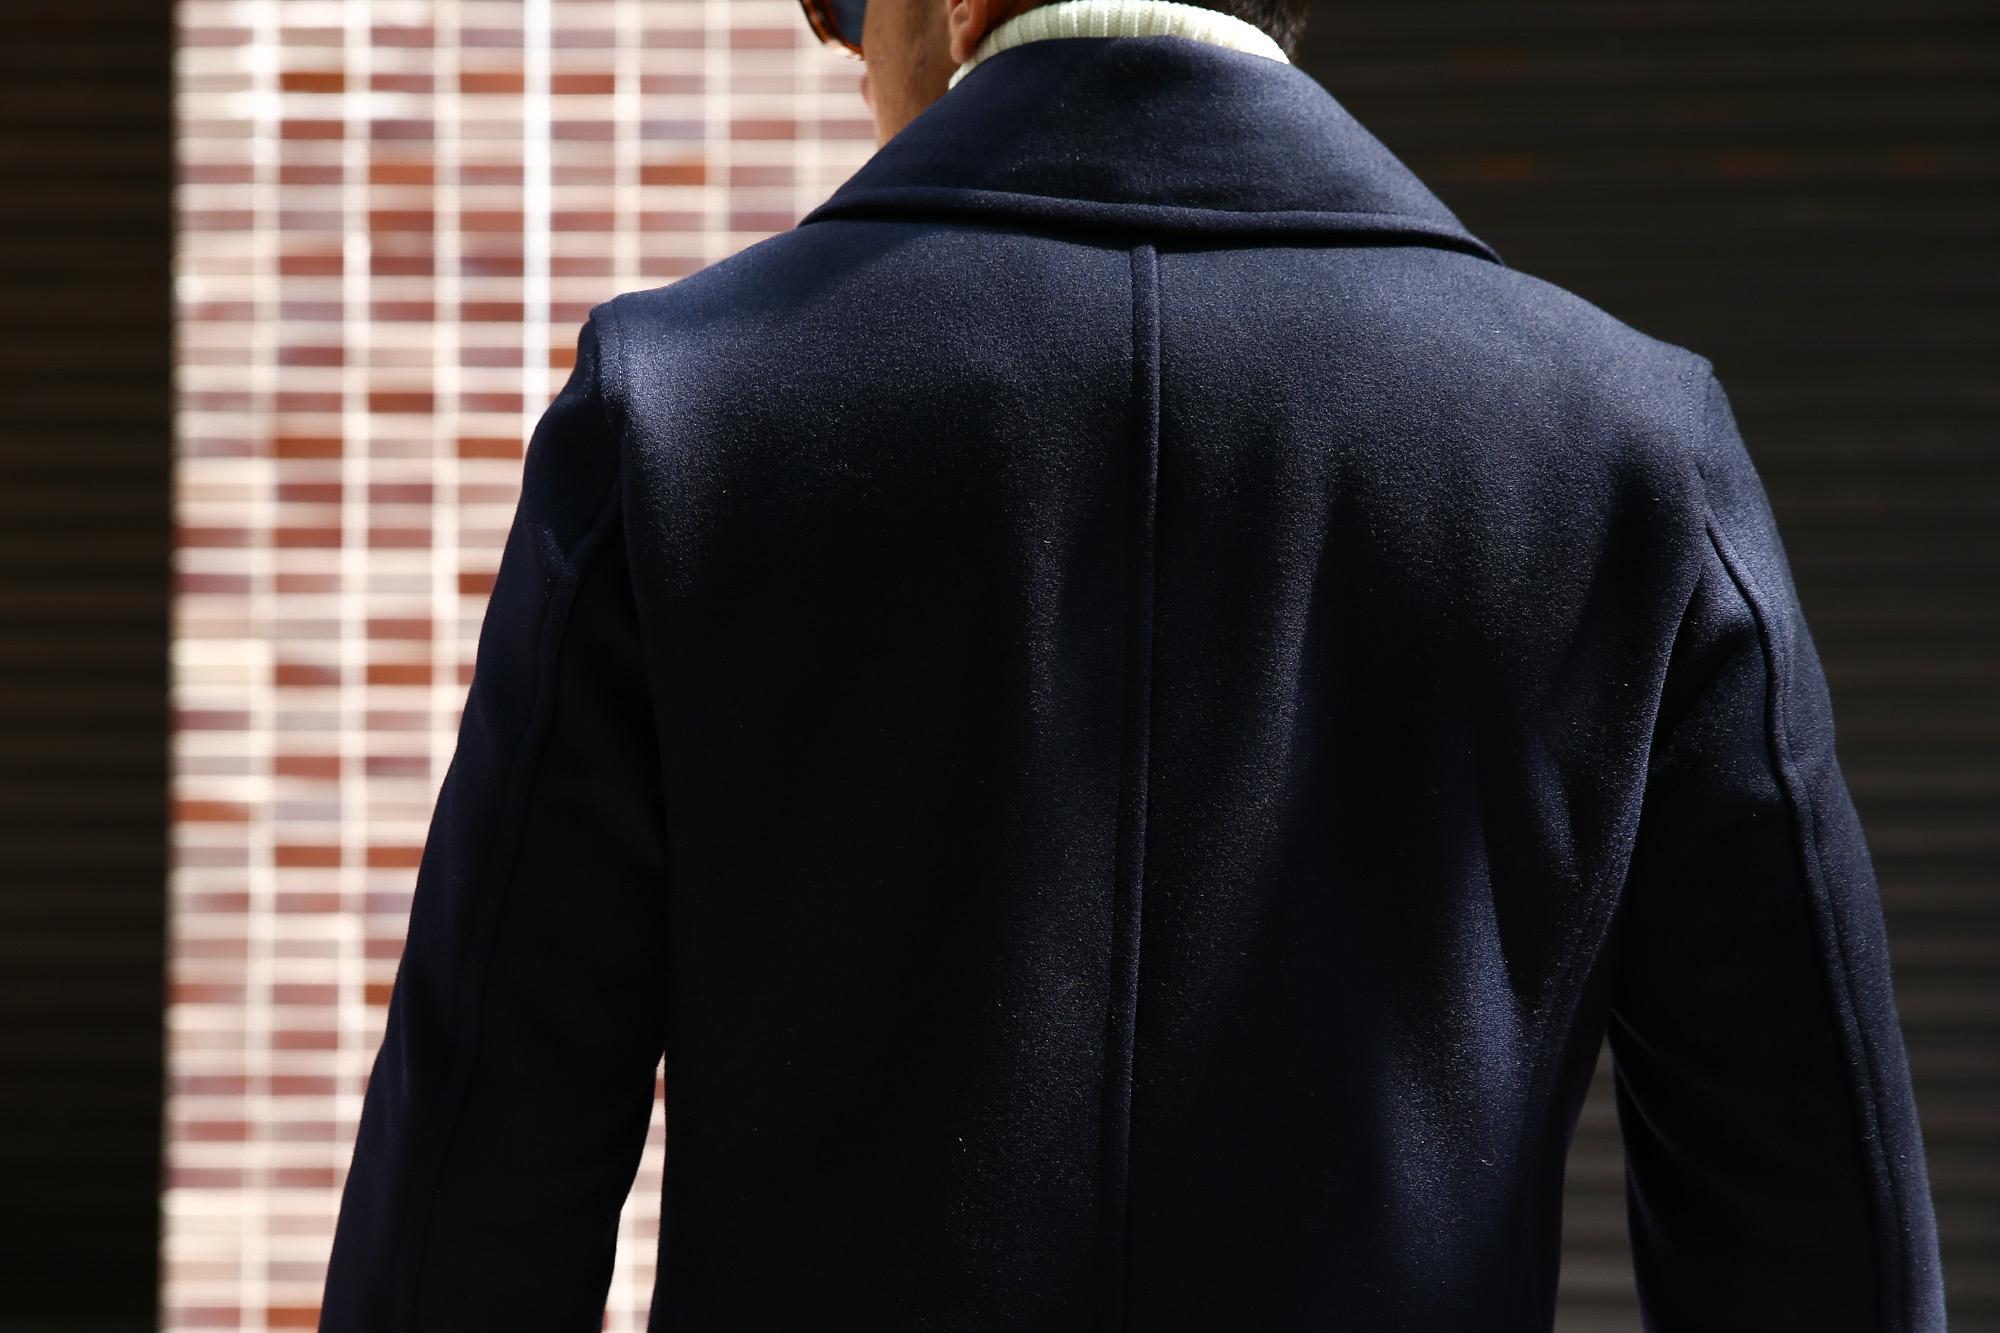 Sealup(シーラップ) 【GENOVA /// ジェノバ】 50002 7591 01 メルトンウール サーモアライニング ロングPコート Pコート ロング ピーコート NAVY (ネイビー・01) MADE IN ITALY(イタリア製) 2017 秋冬新作 sealup シーラップ 愛知 名古屋 ZODIAC ゾディアック セレクトショップ シーラップPコート コート 44,46,48,50,52